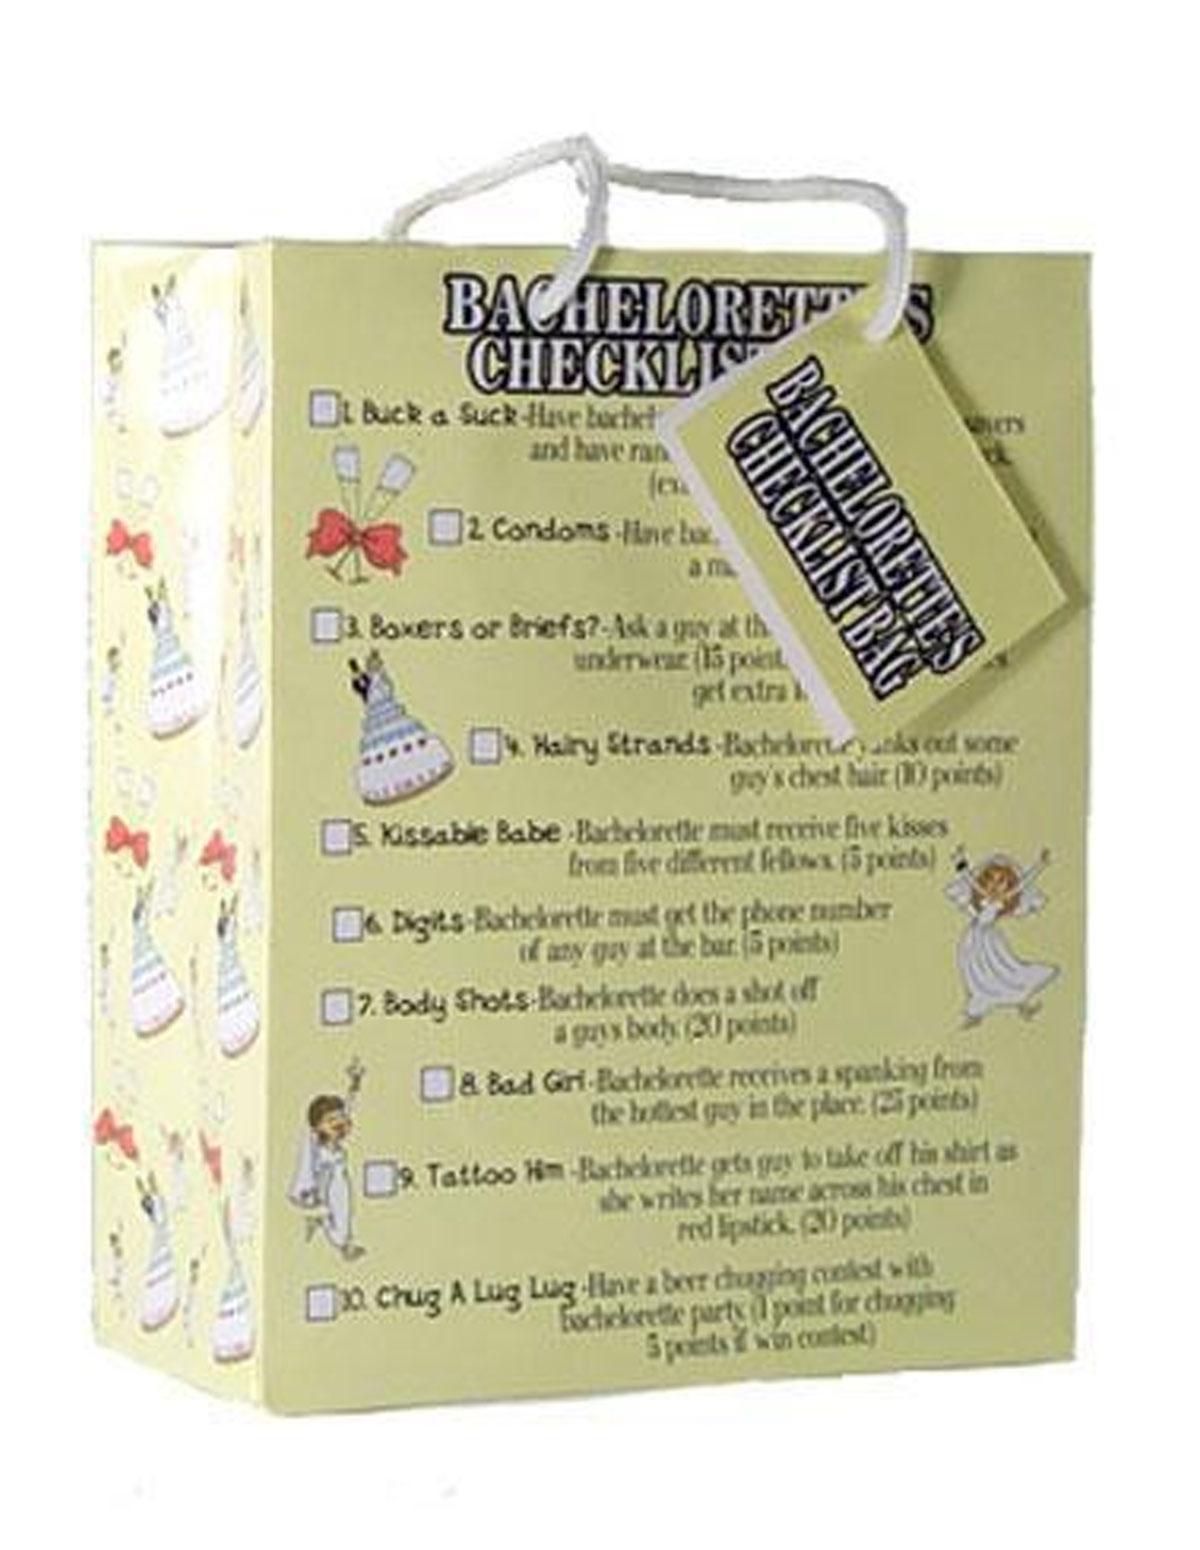 Bachelorette Checklist Bag